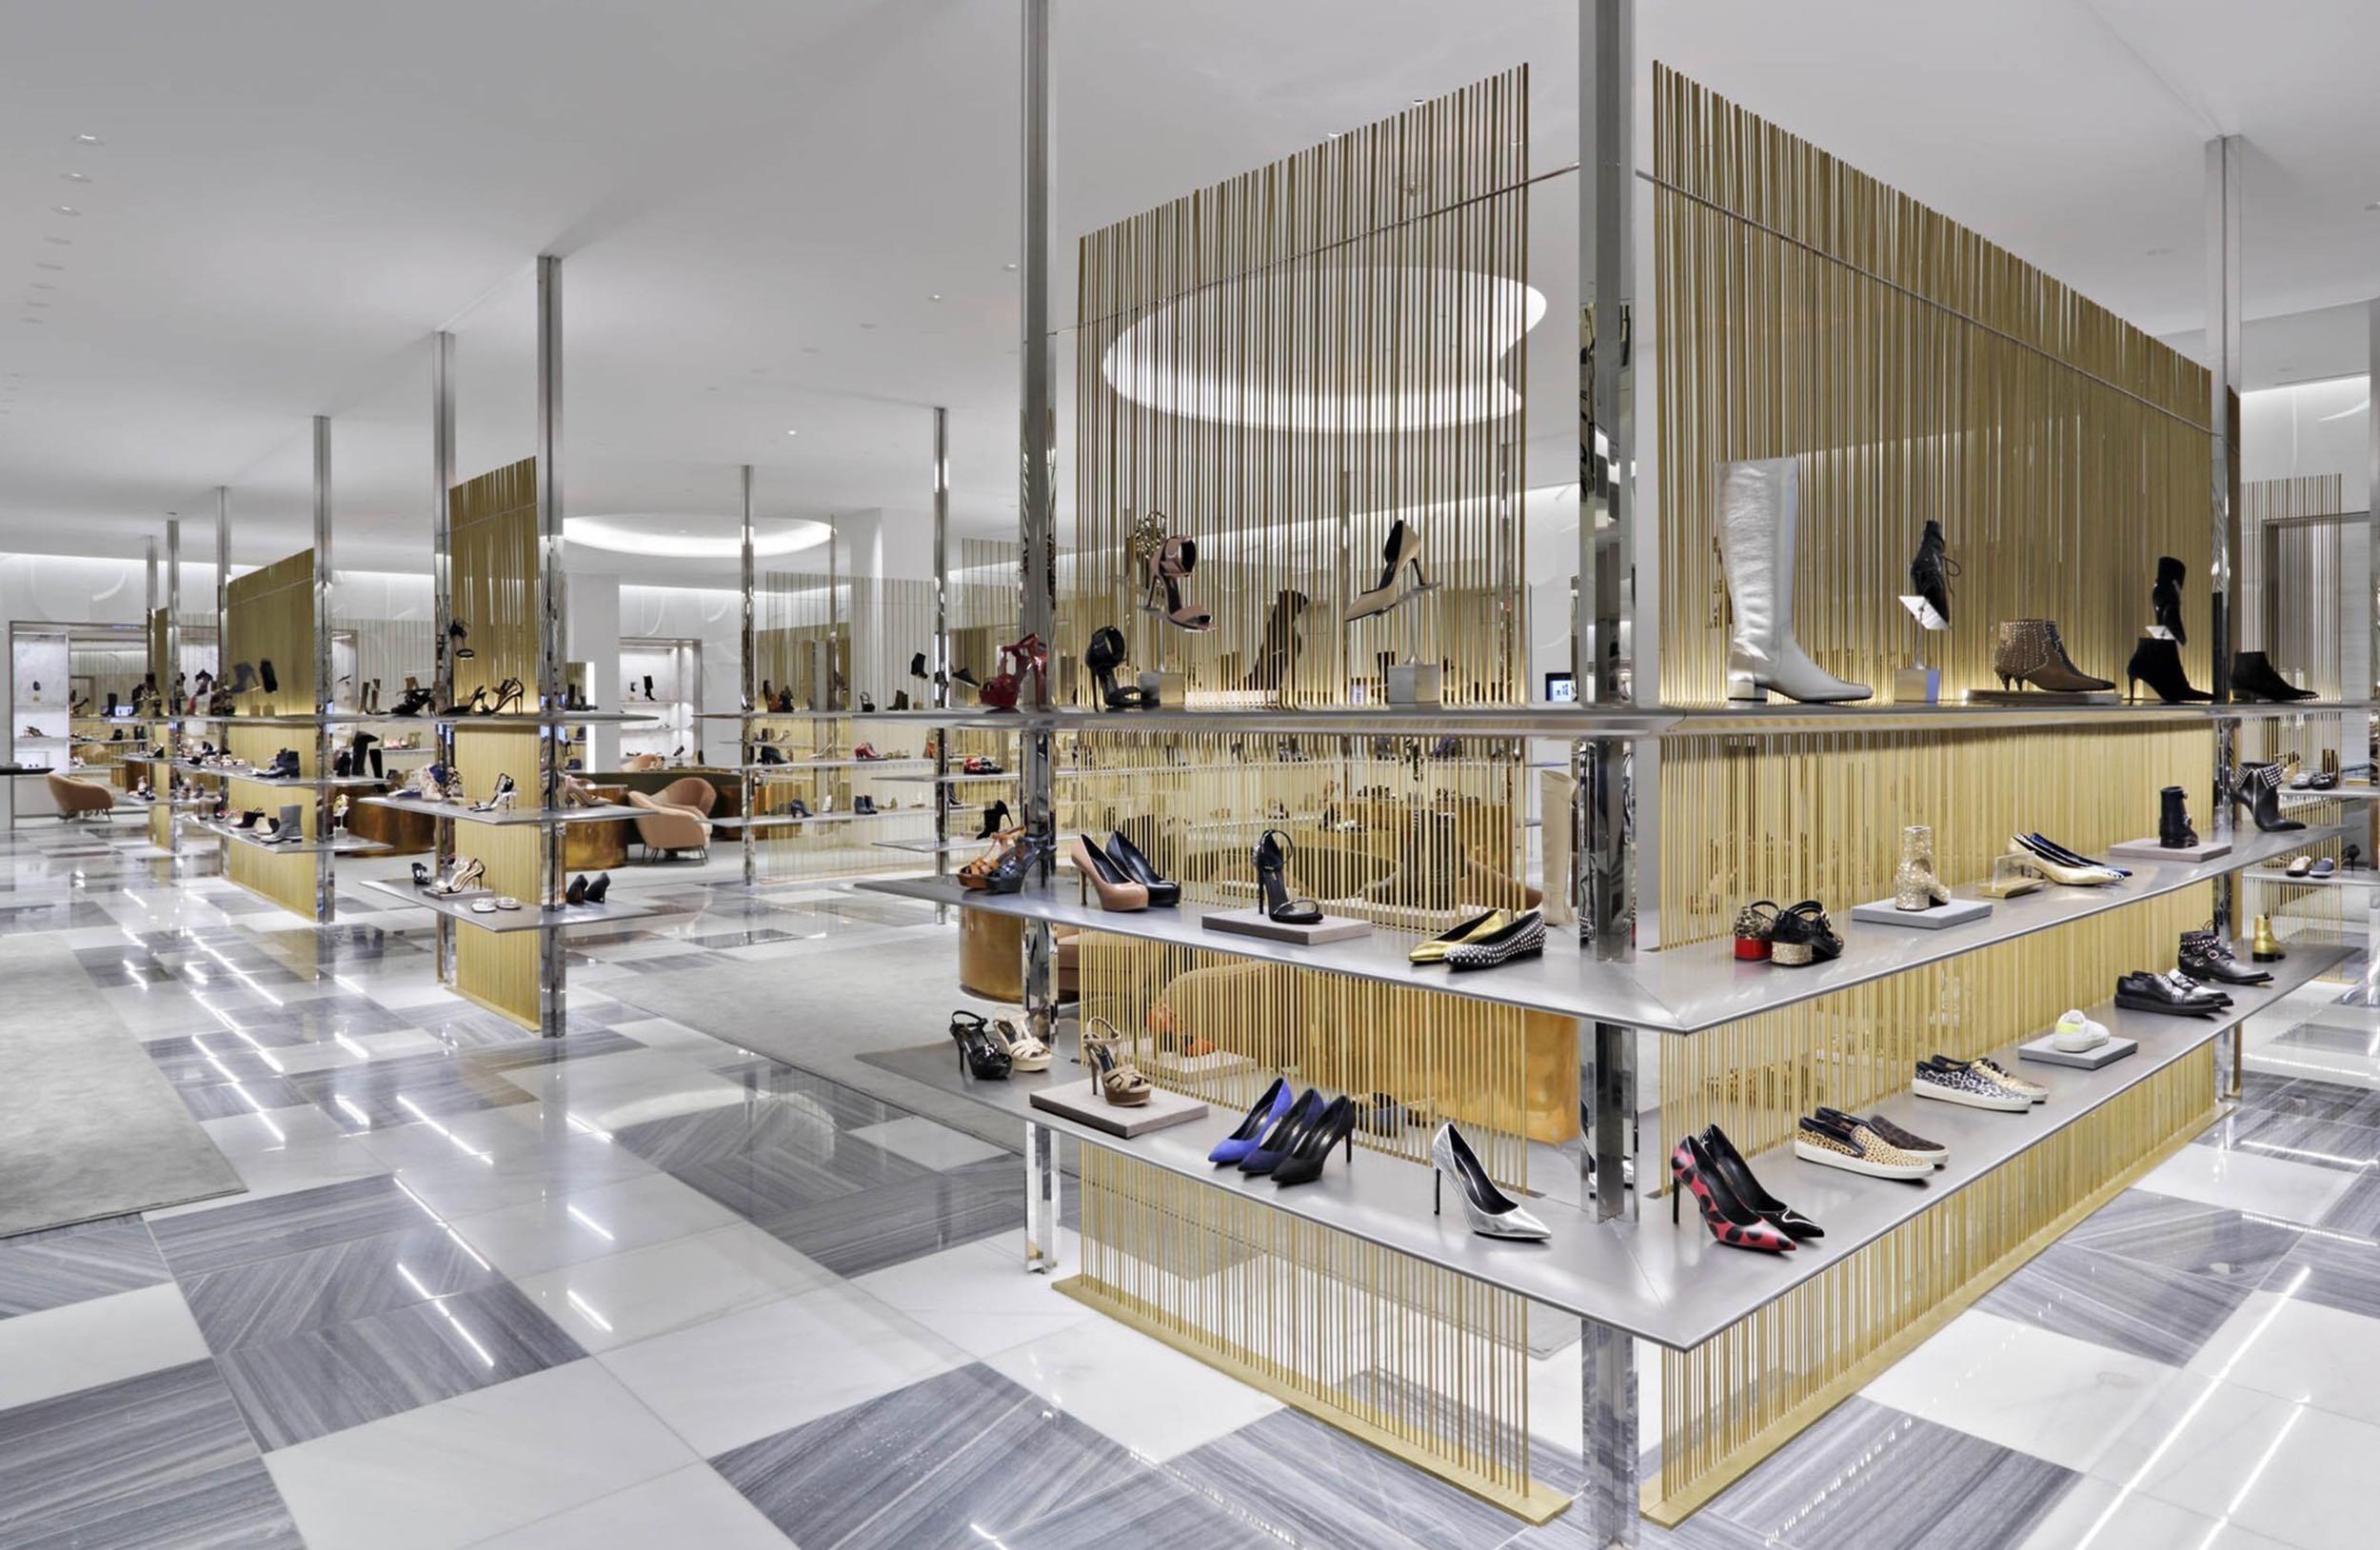 Mármol en centros comerciales - Barneys - Marble in shopping centers